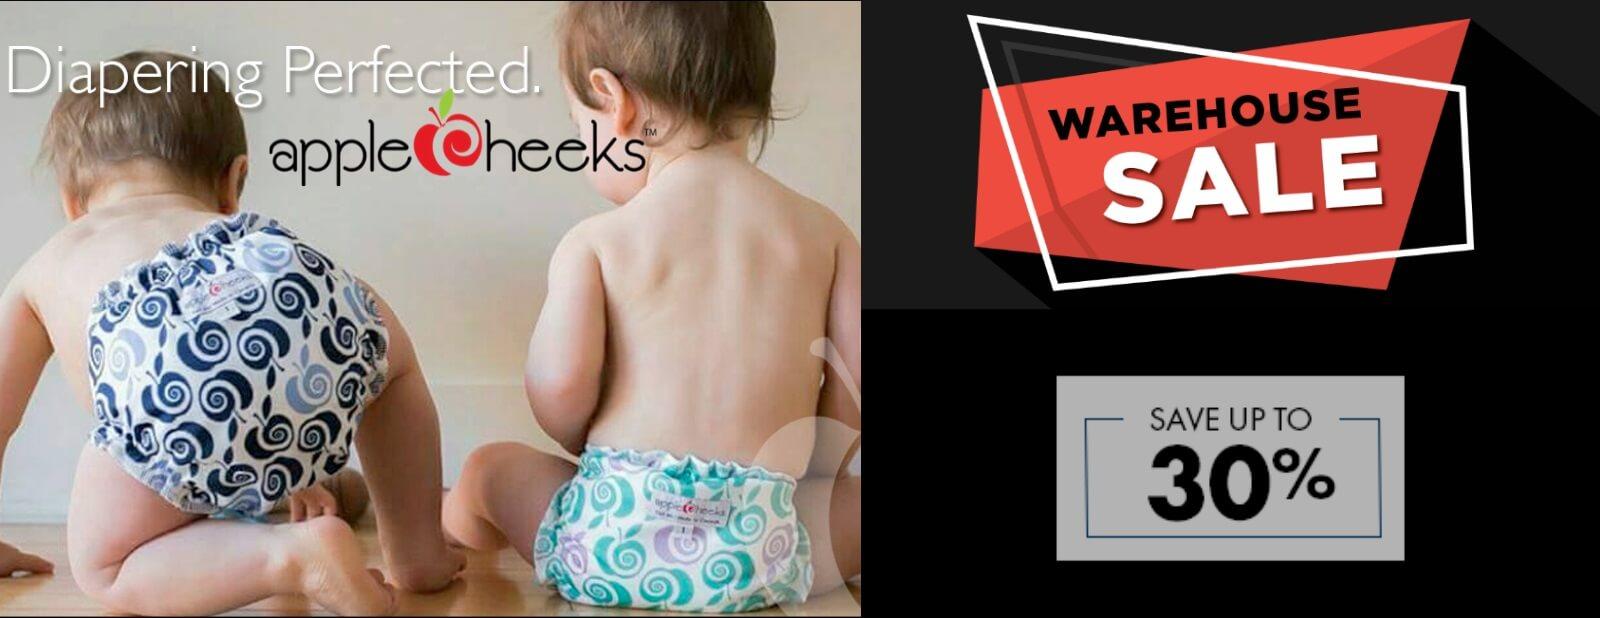 applecheeks cloth diapers warehouse sale